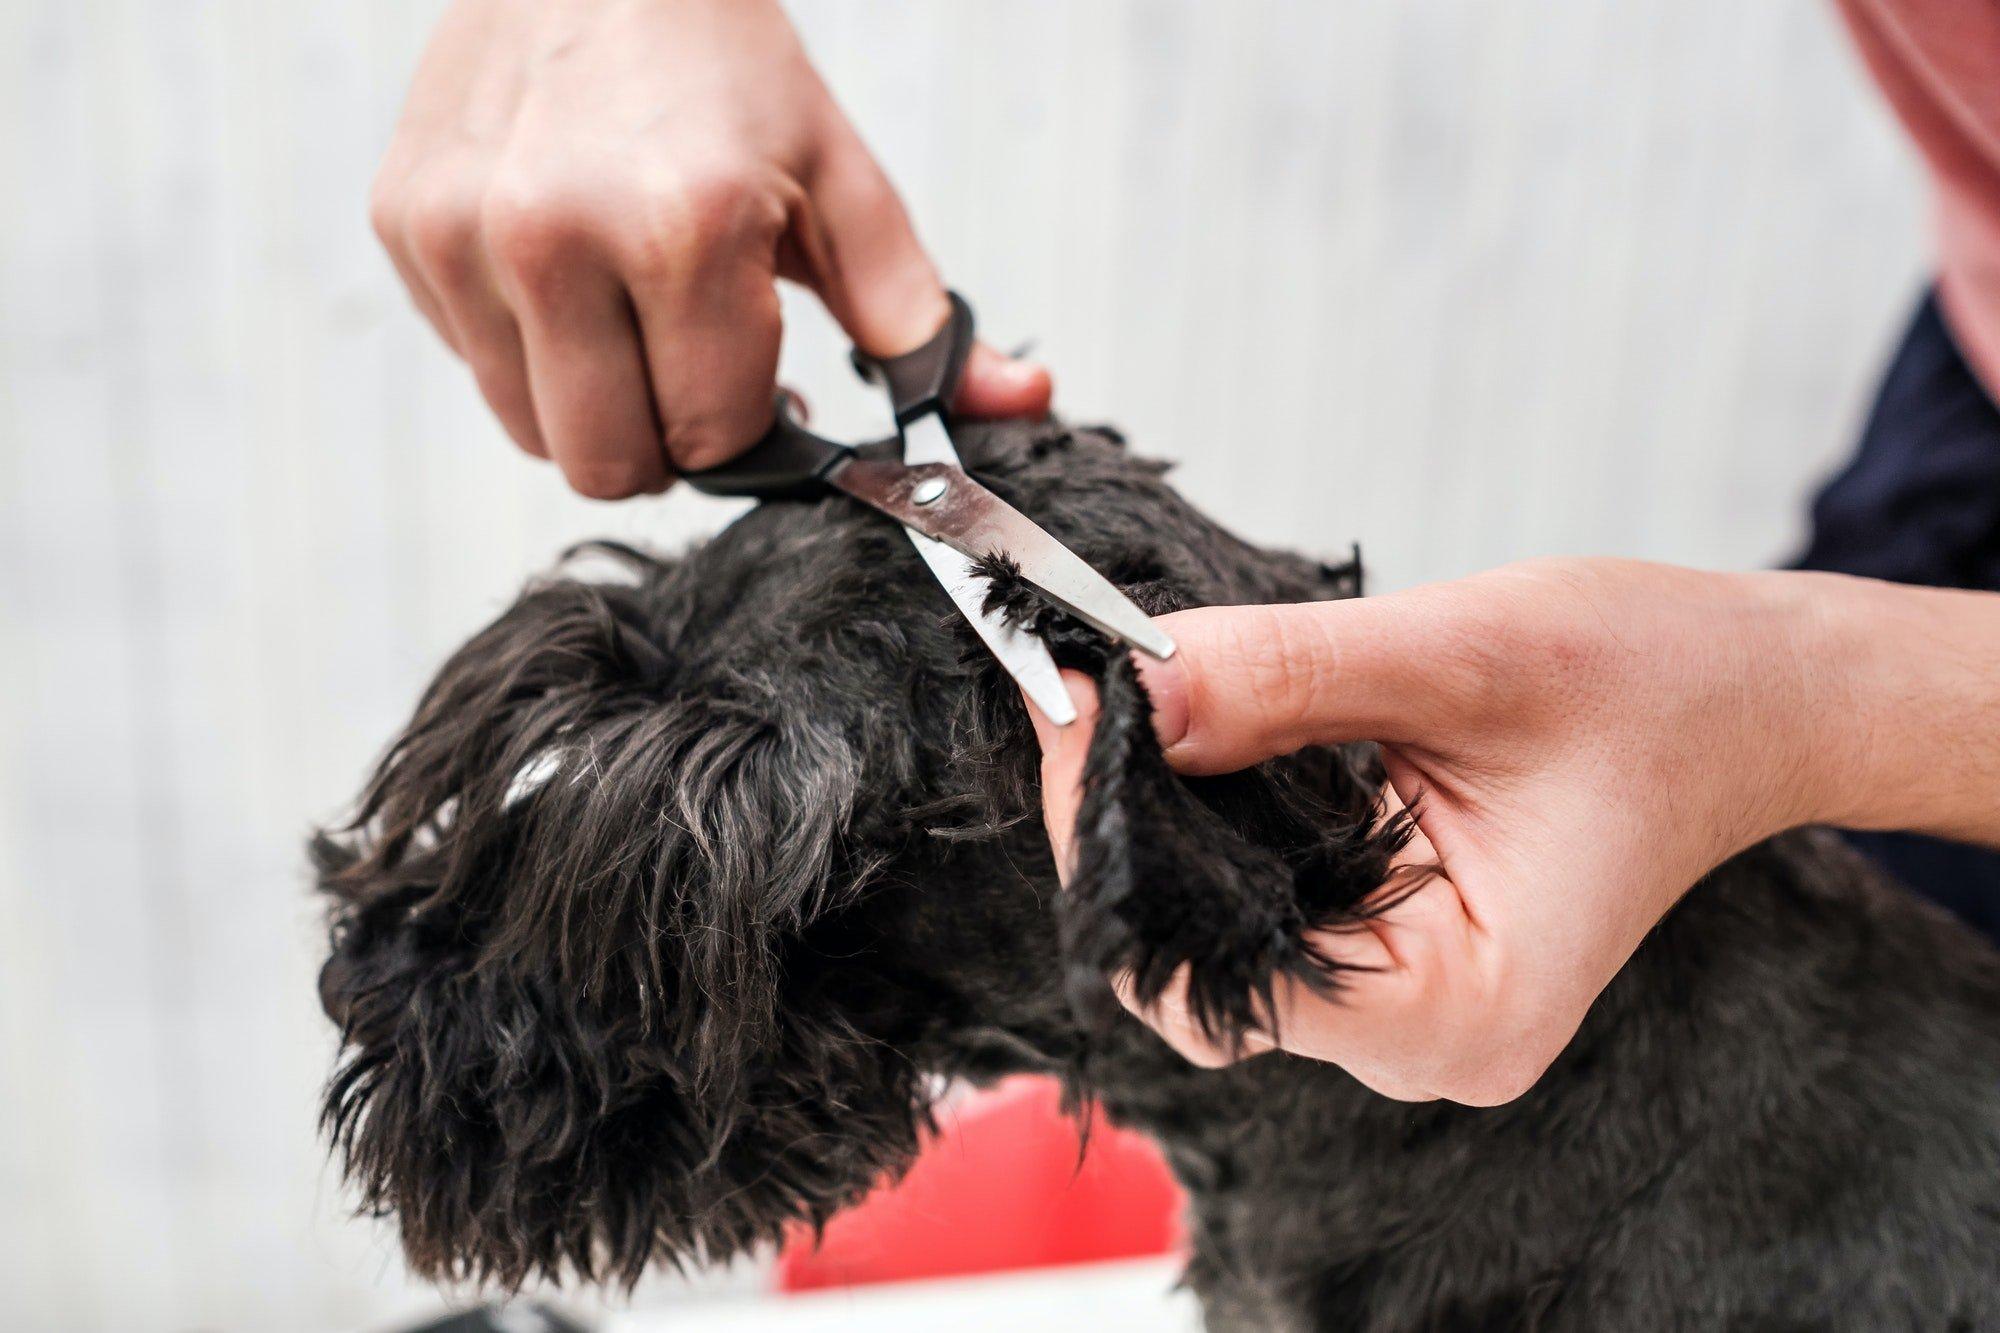 shave dog to prevent a flea infestation